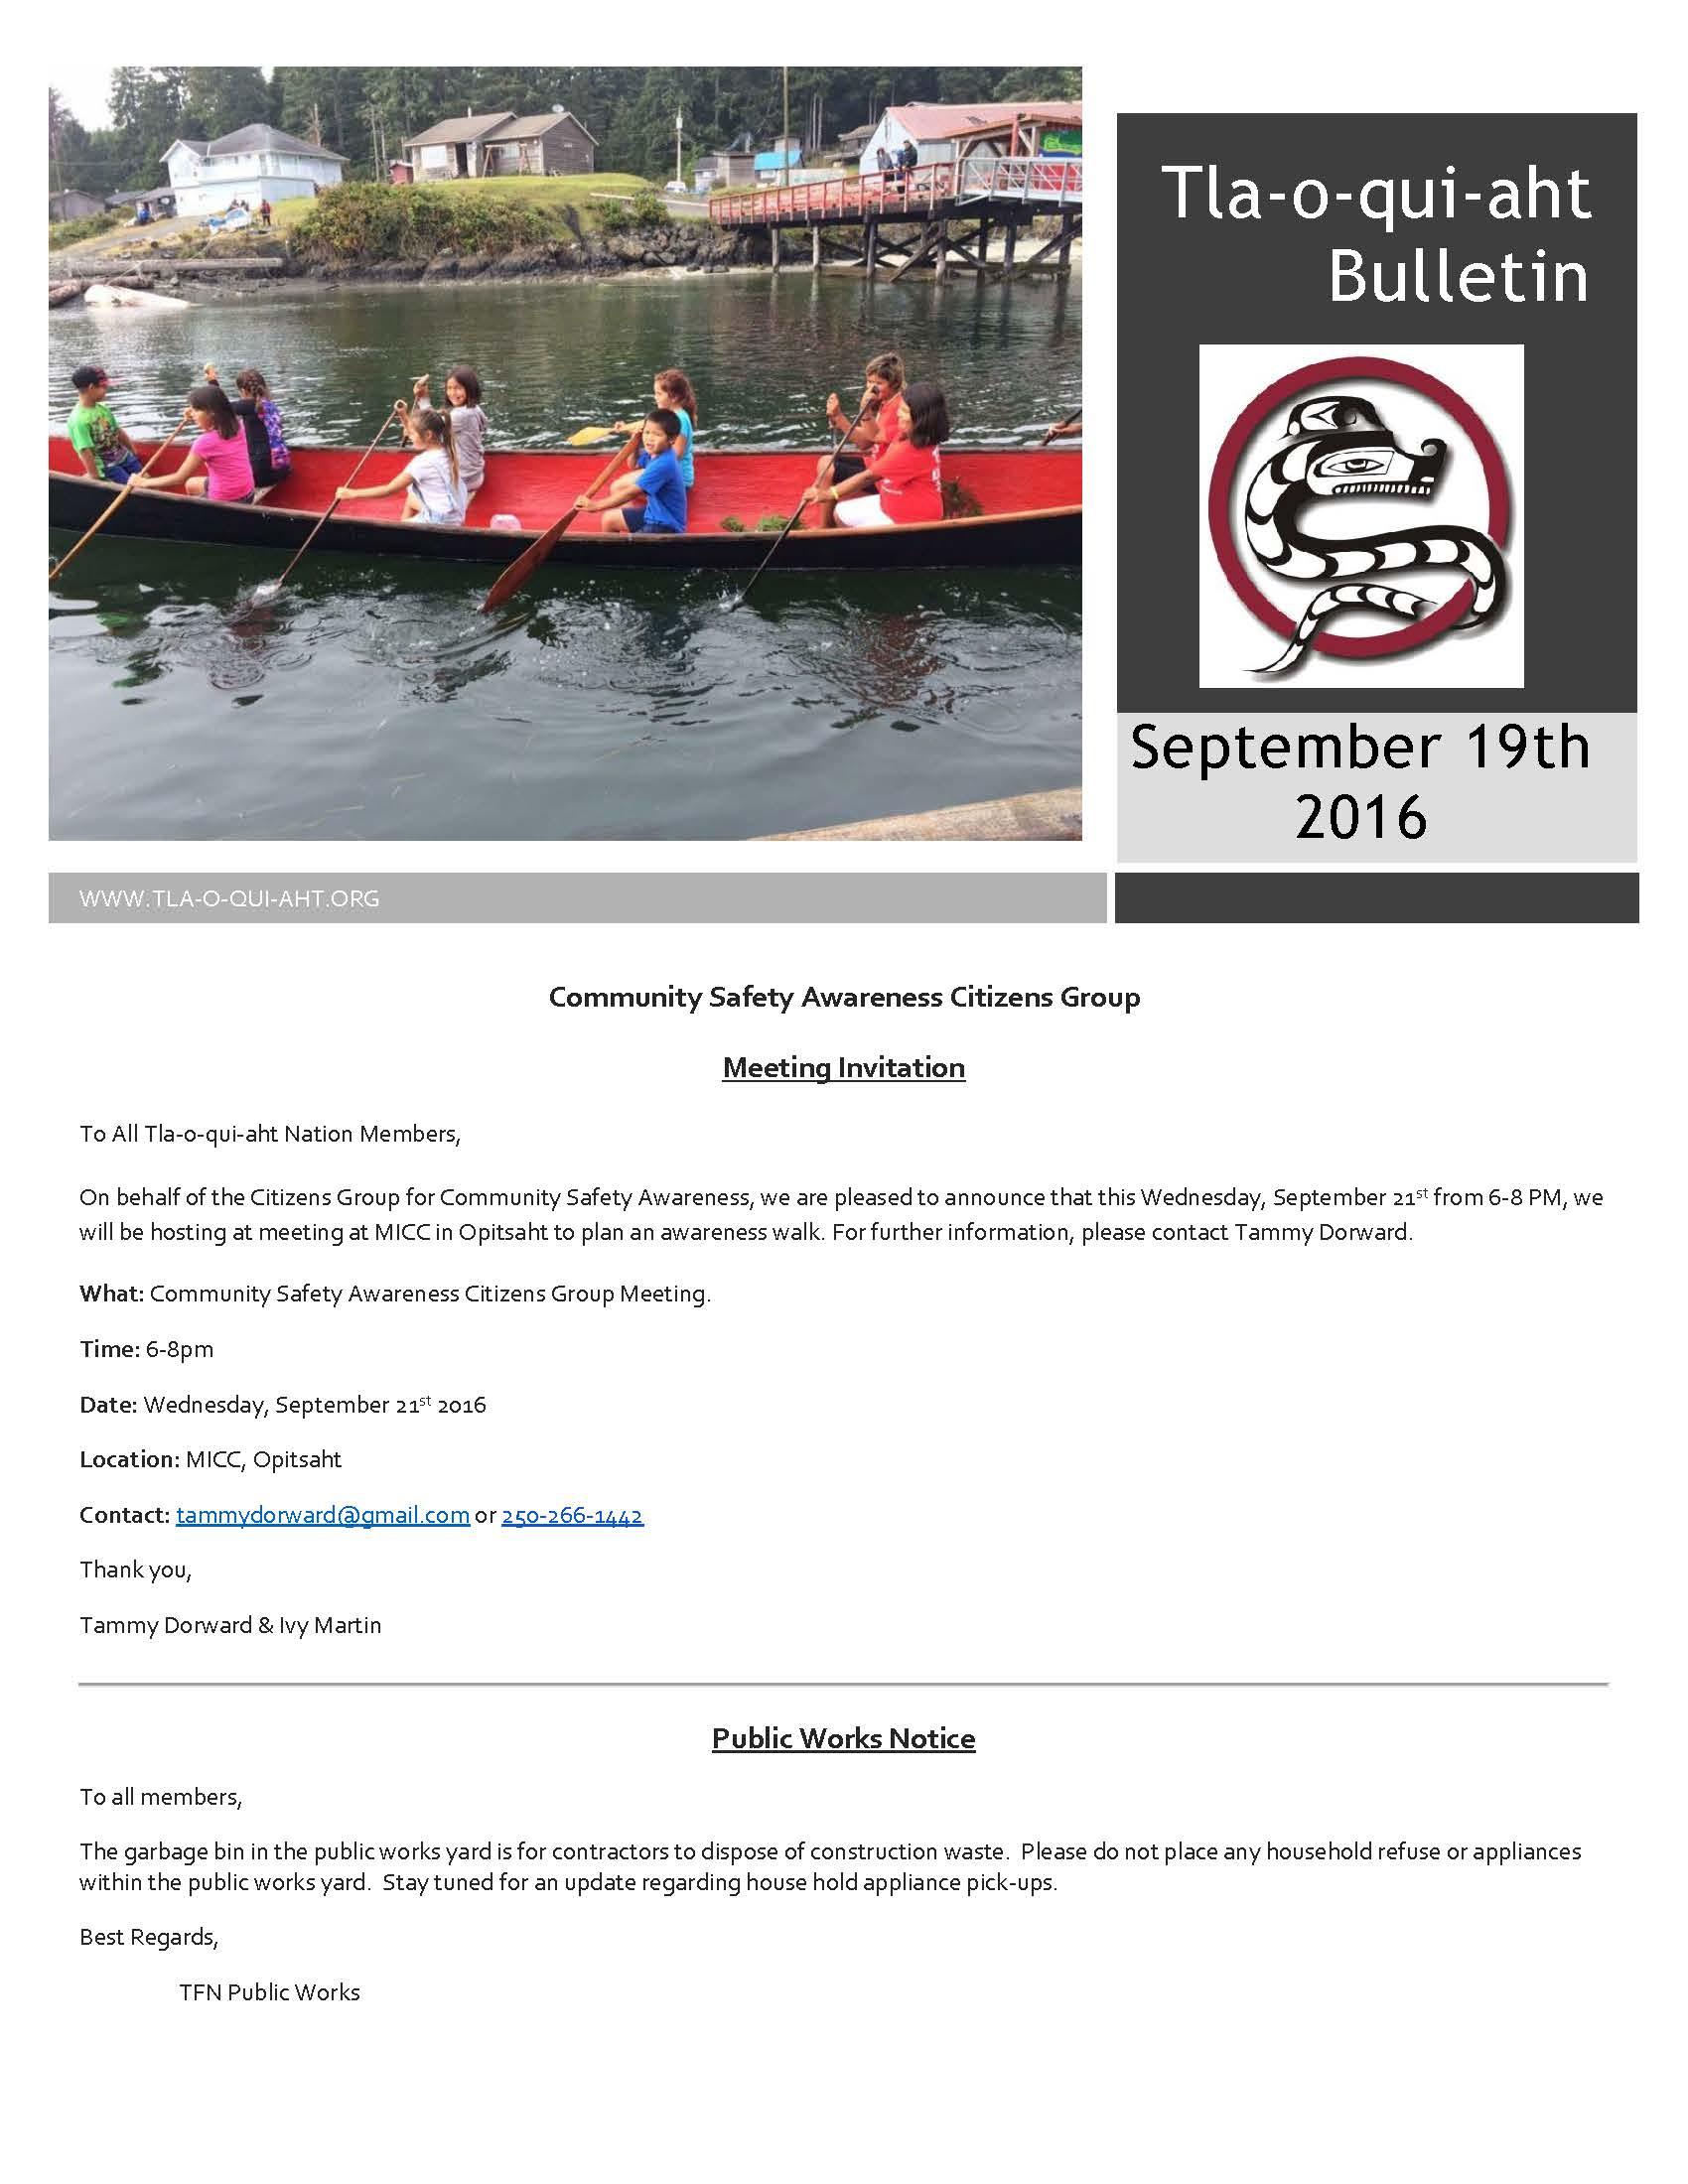 TFN Bulletin Sept 19-2016_Page_01.jpg